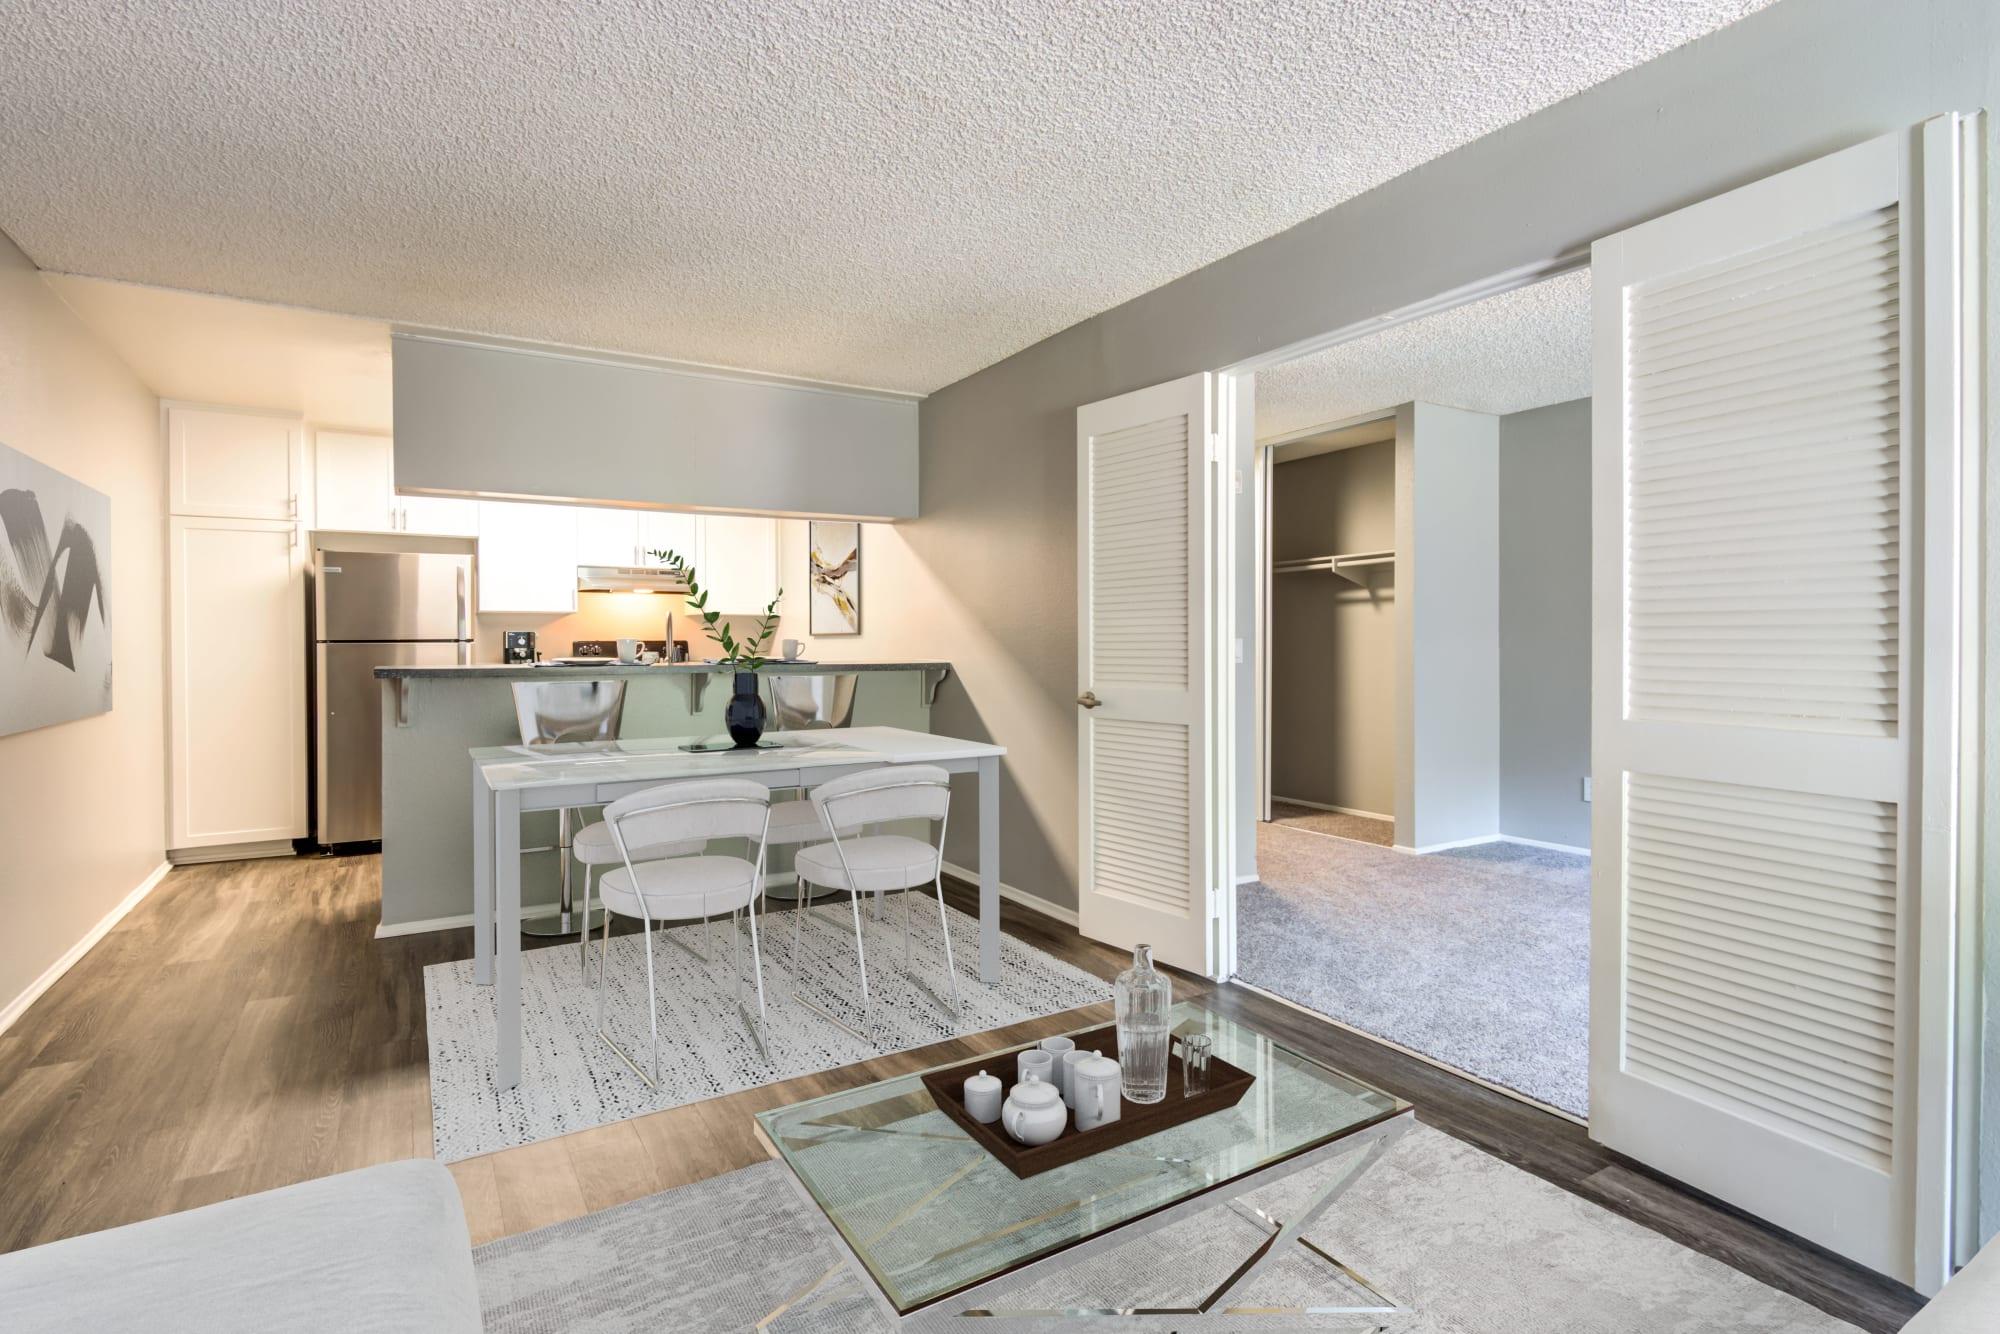 Hardwood-style floors at Hillside Terrace Apartments in Lemon Grove, California